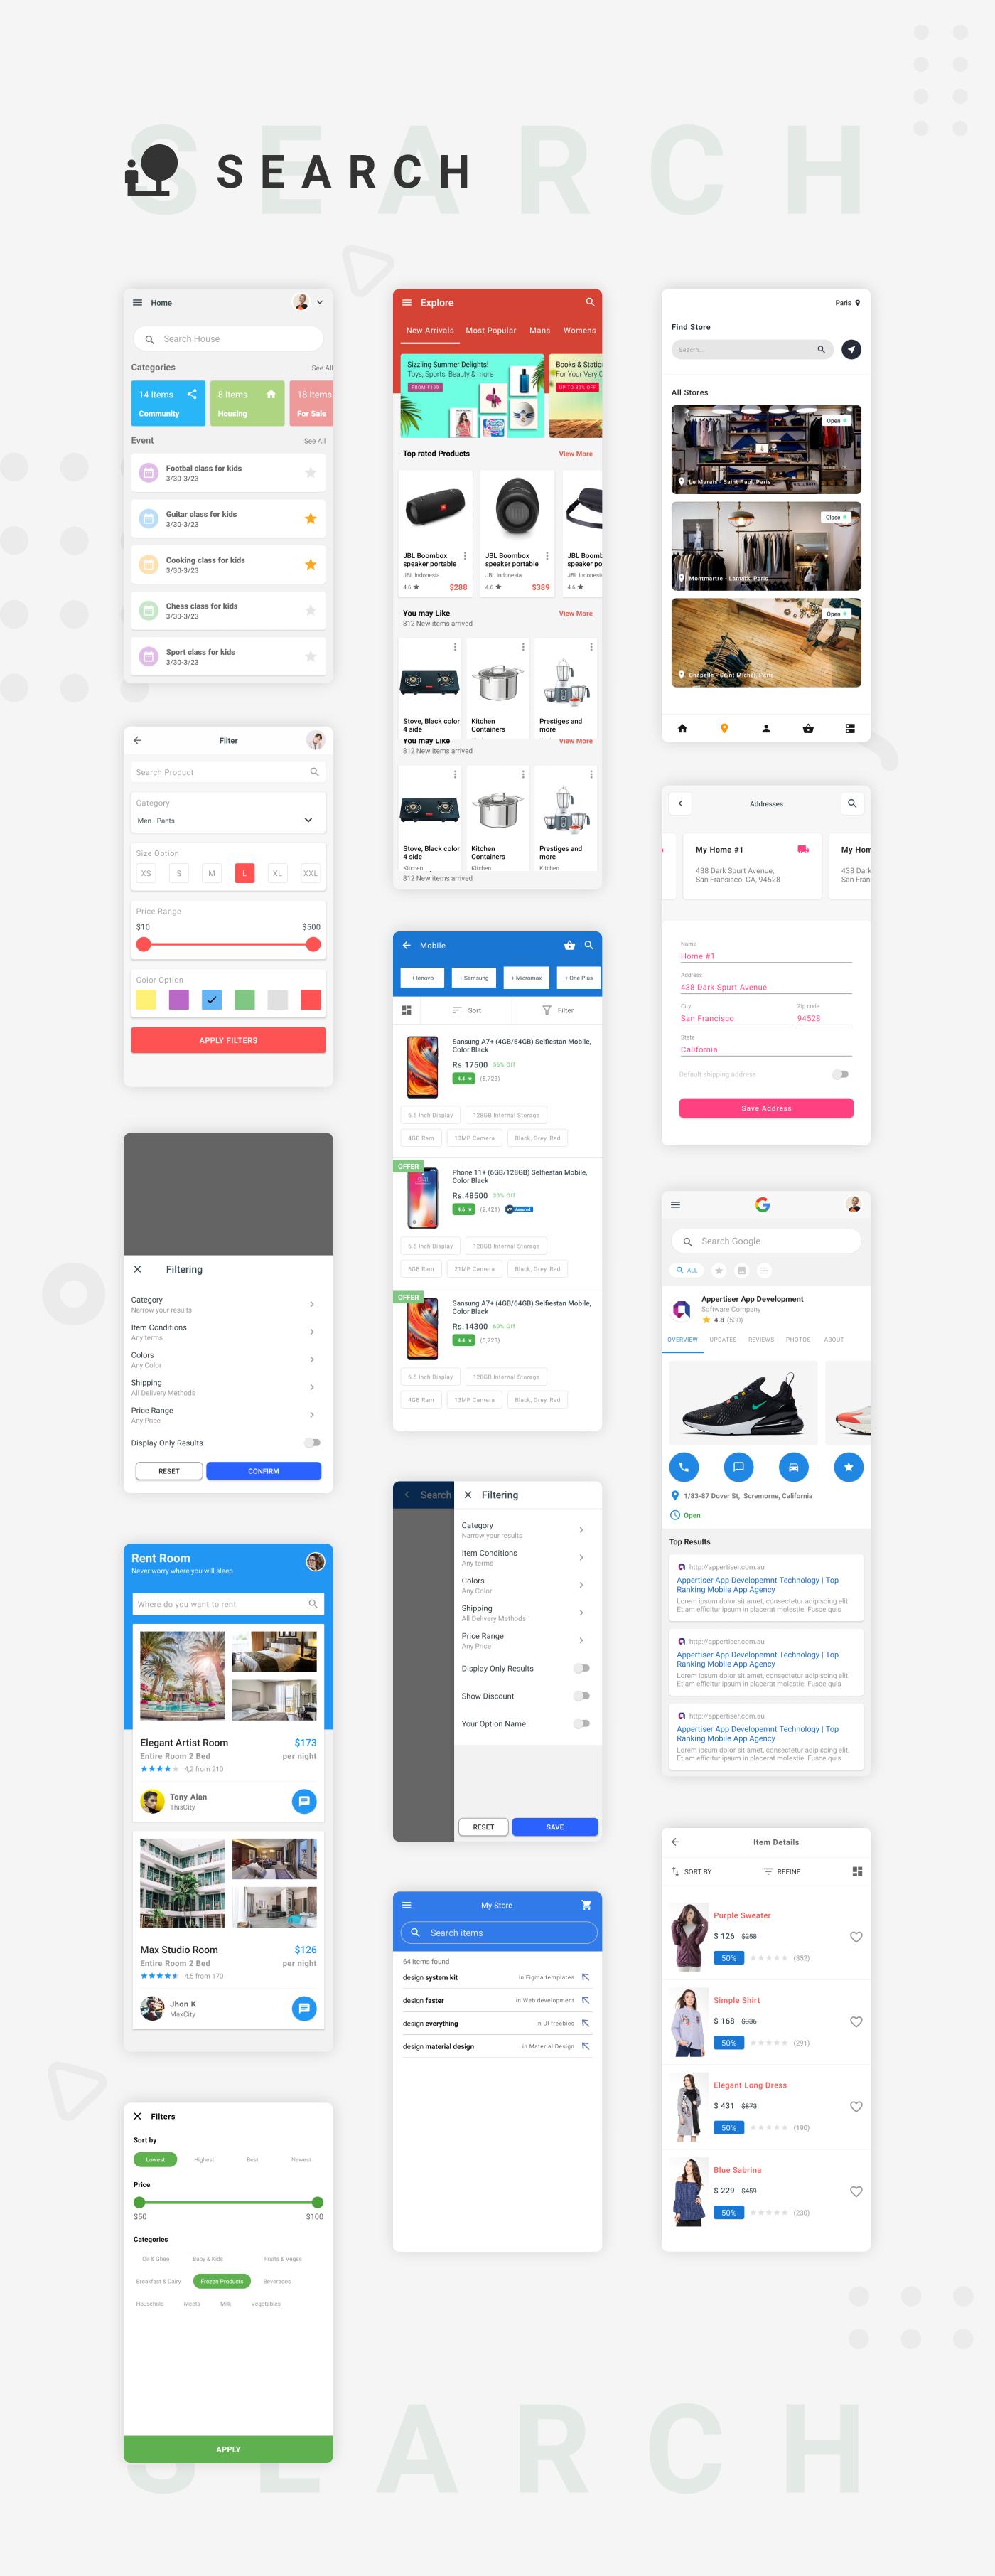 EcommerceX - Premium Ecommerce App UI Kit Template 1.0 - 7